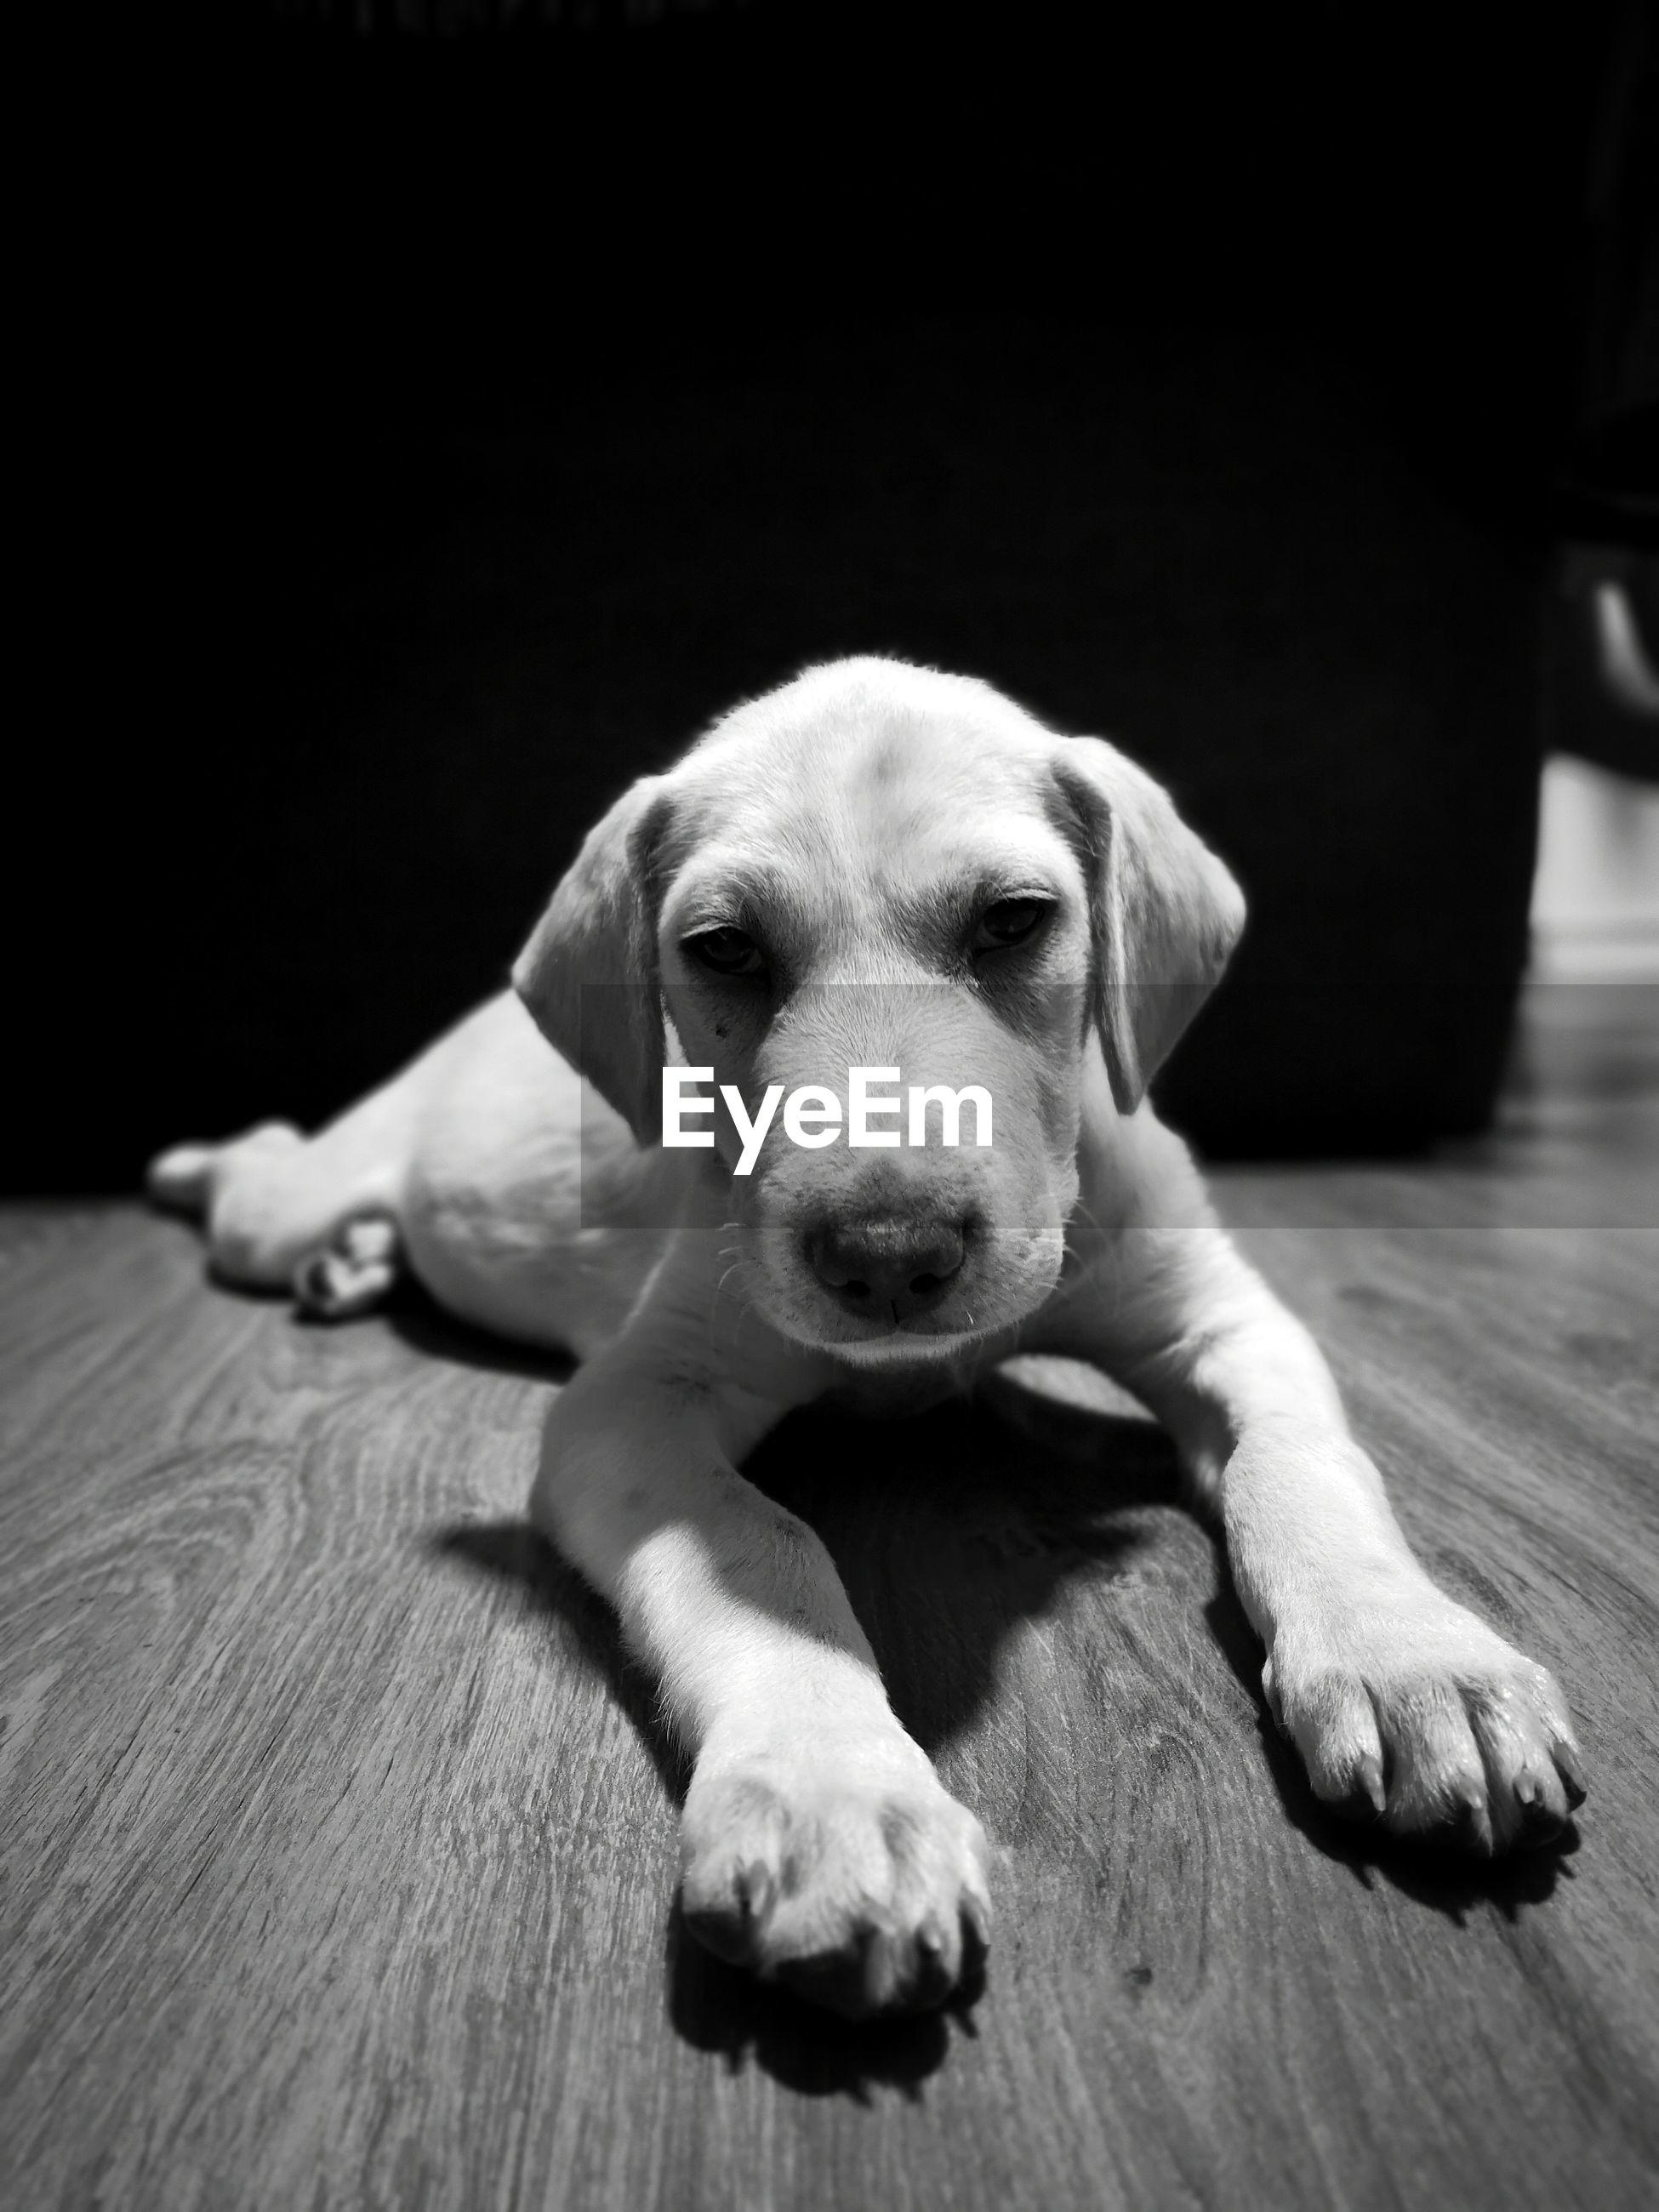 PORTRAIT OF DOG RELAXING ON HARDWOOD FLOOR